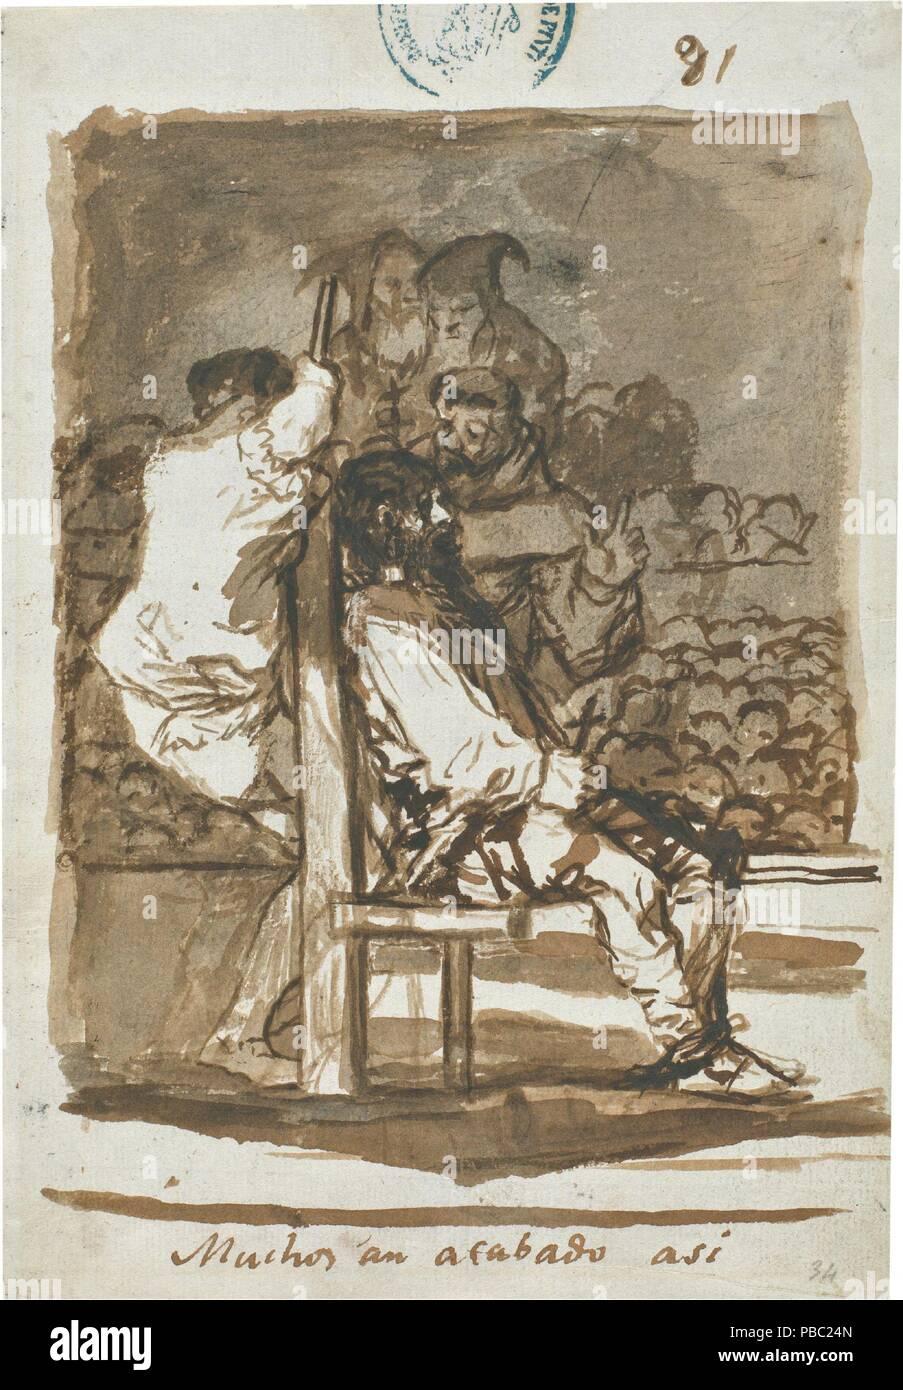 Francisco de Goya y Lucientes / 'Many have ended up like